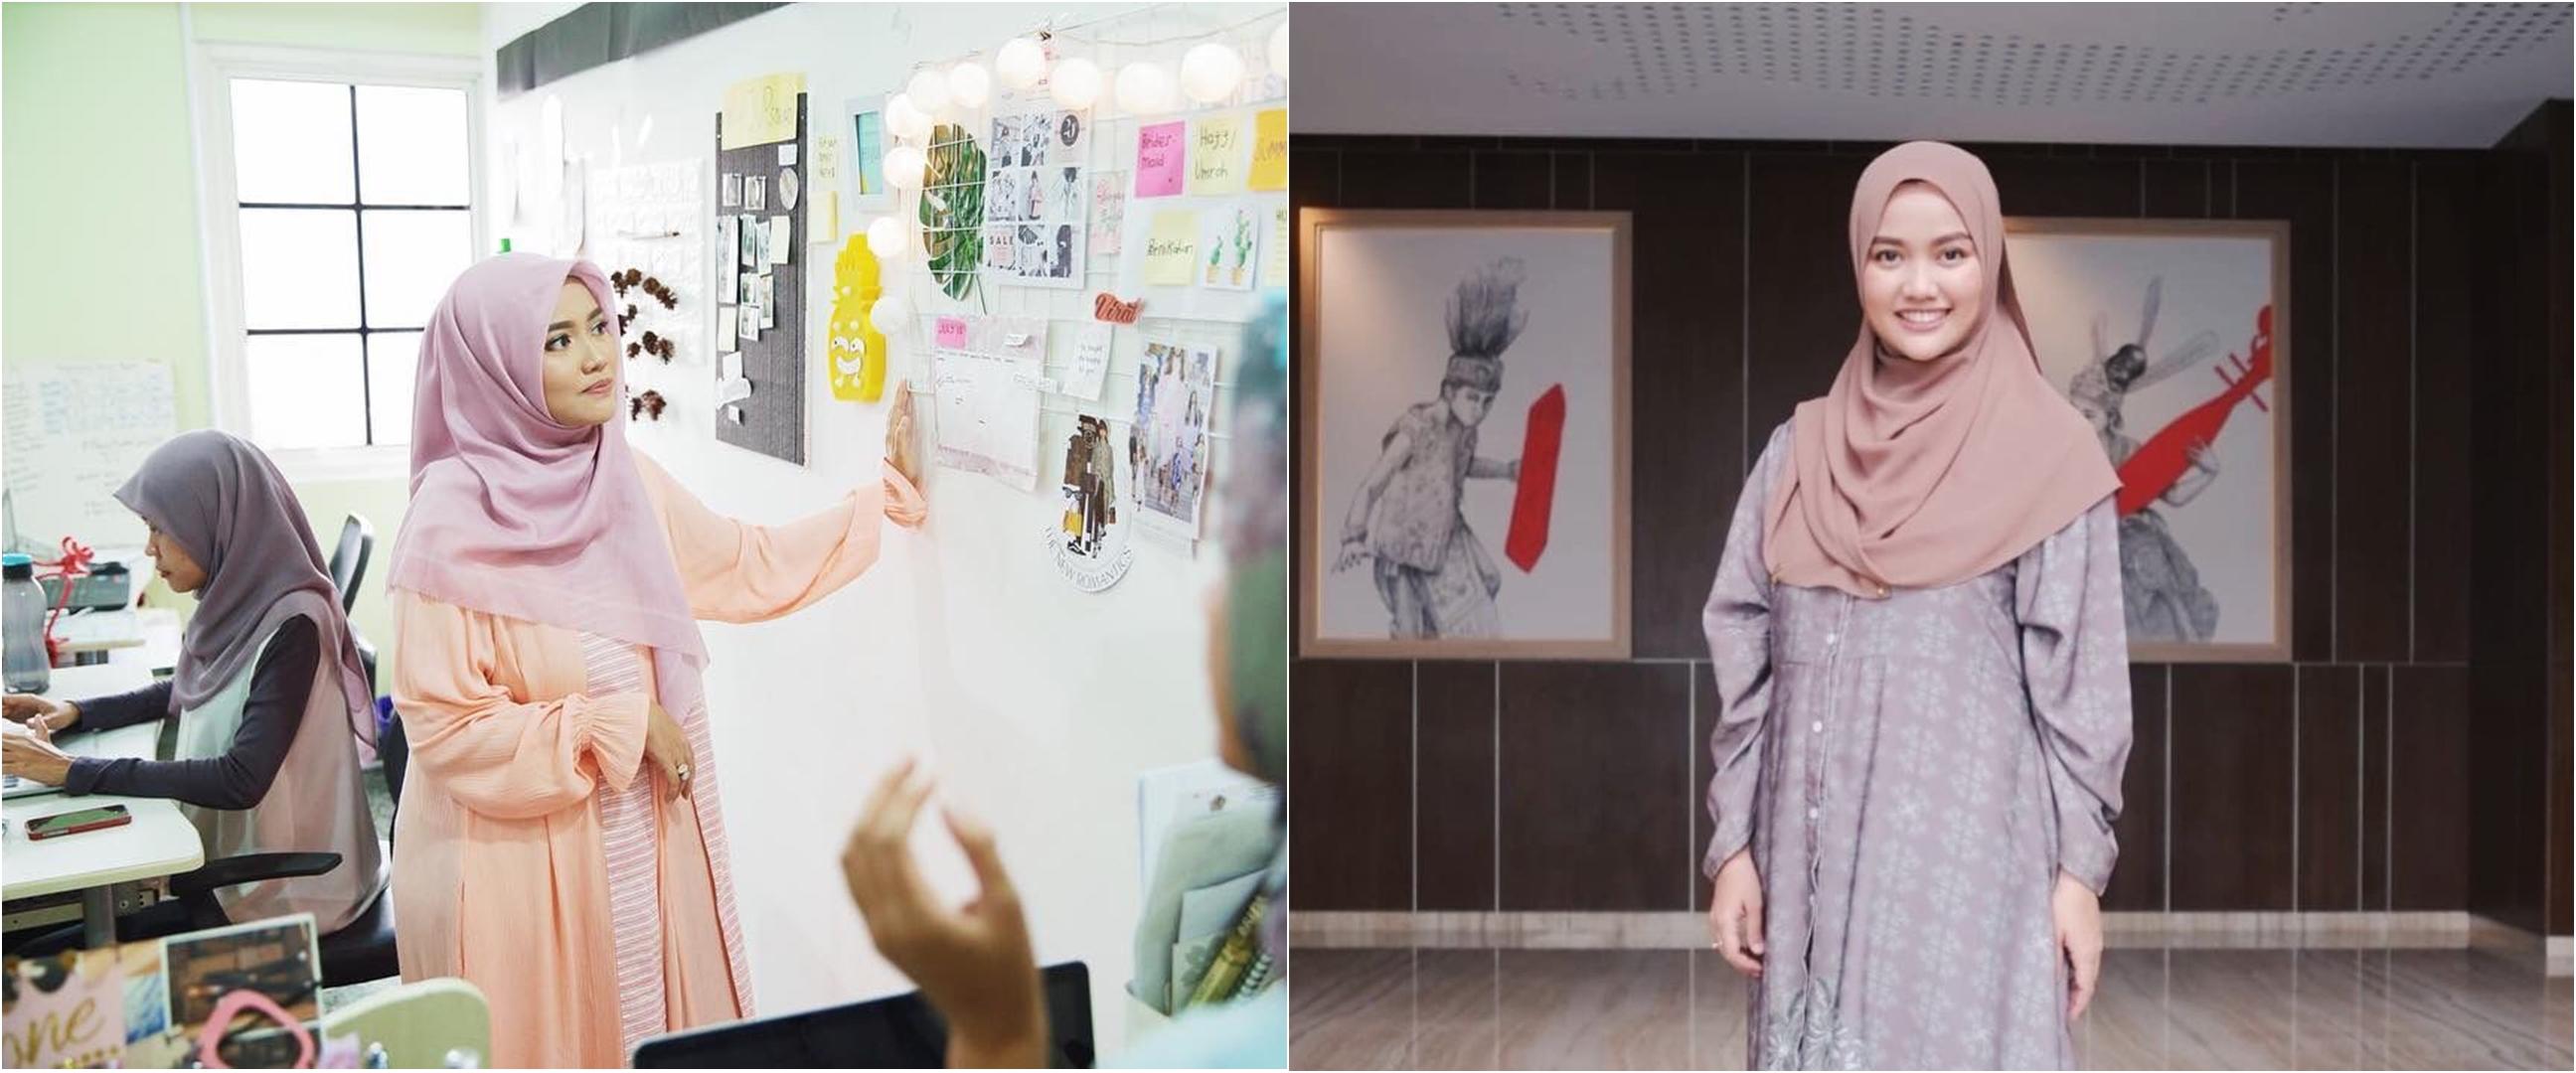 Dukung pelaku fashion lokal, e-commerce ini siapkan Rp 100 miliar